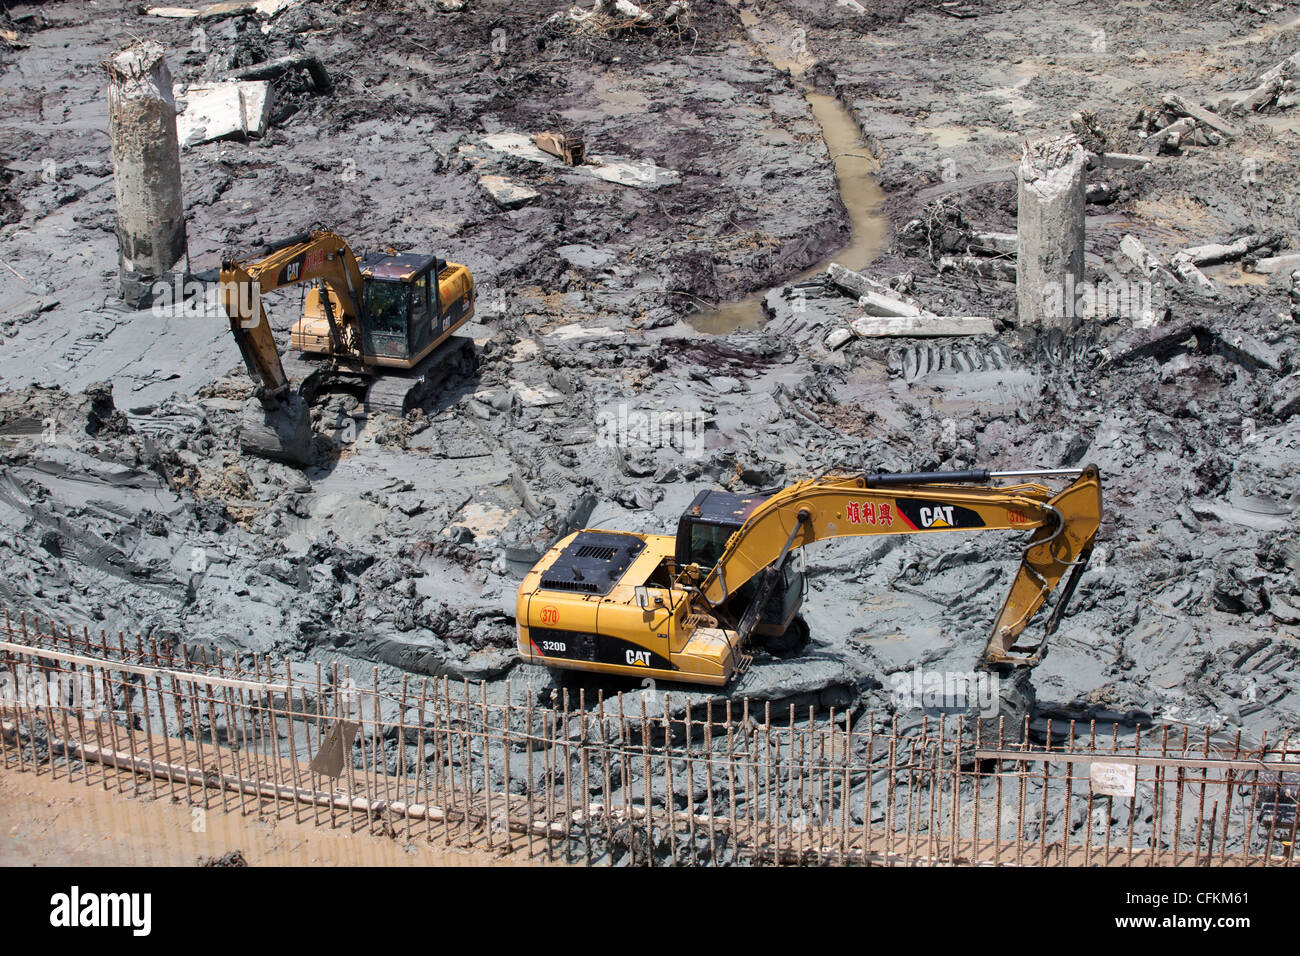 Mechanical Excavators Working in Mud - Stock Image